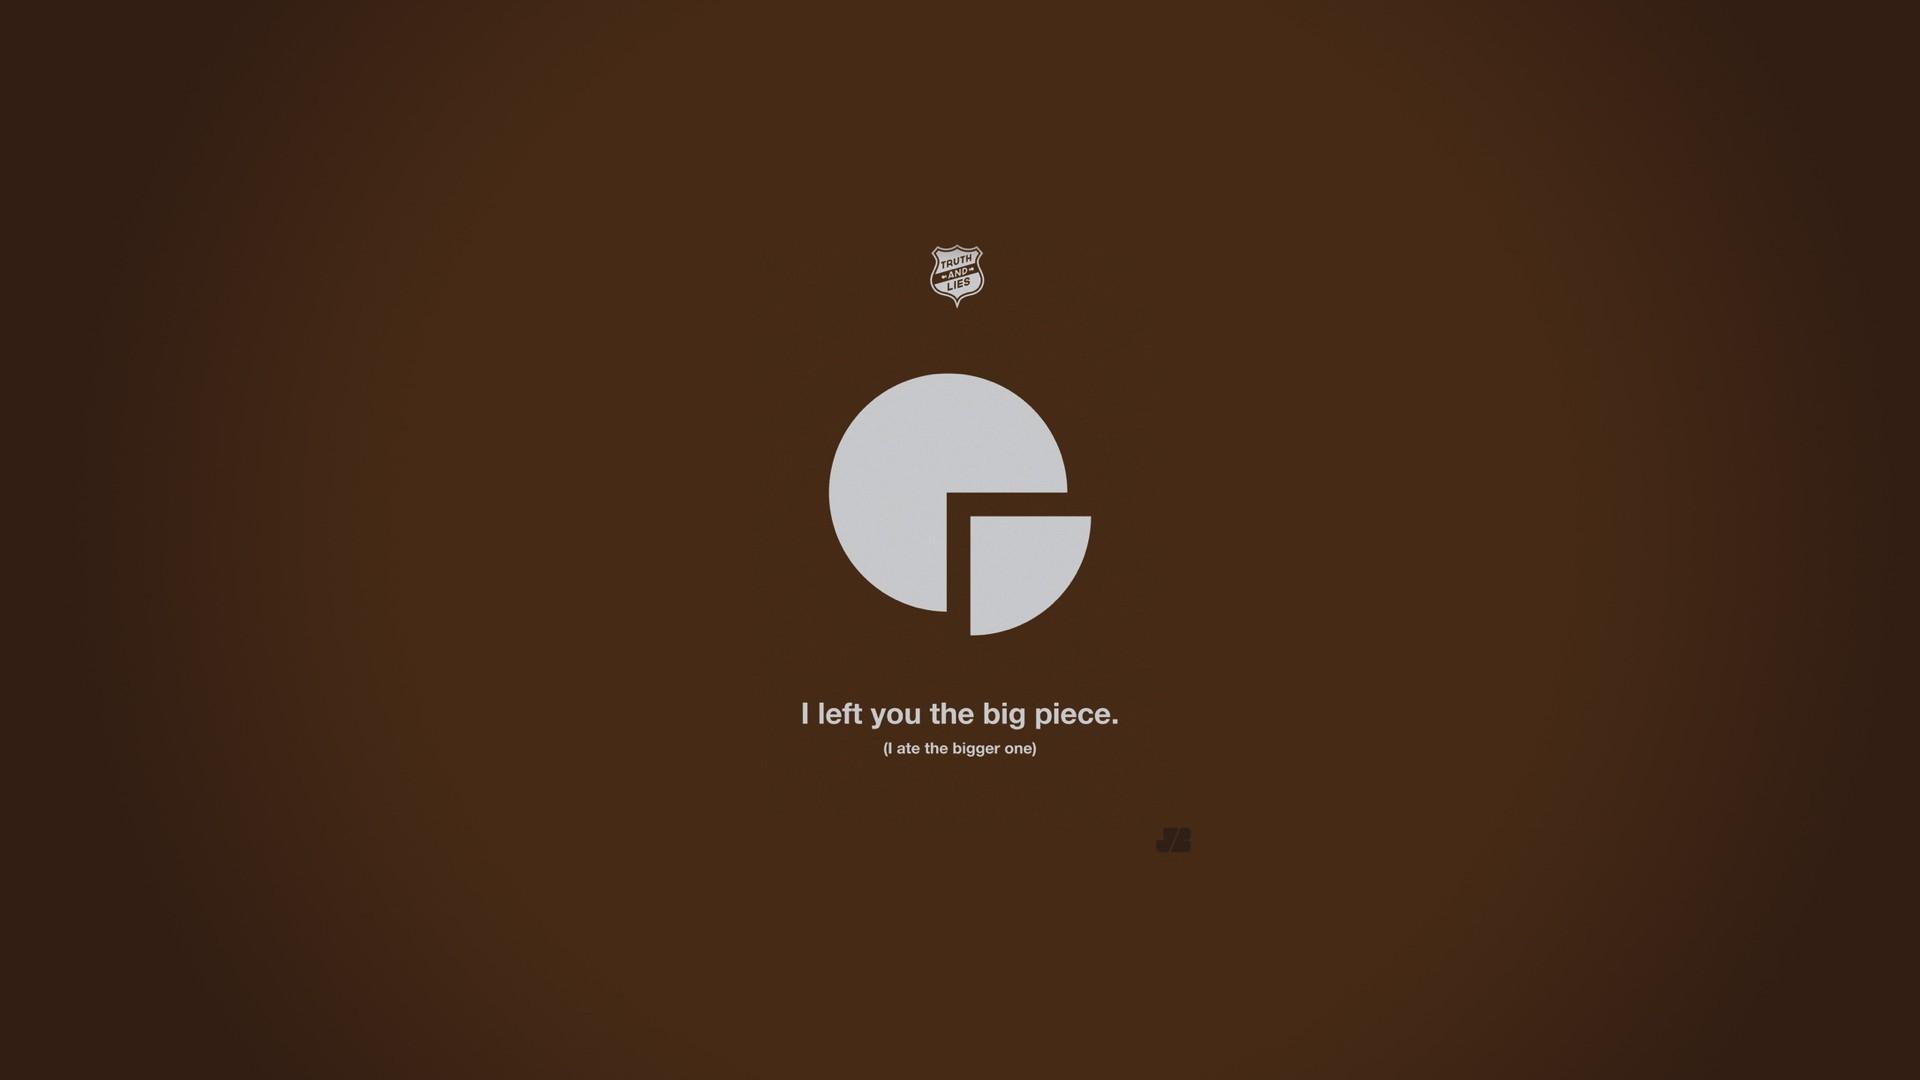 illustration quote simple background minimalism humor text logo circle brand screenshot computer wallpaper font 229550